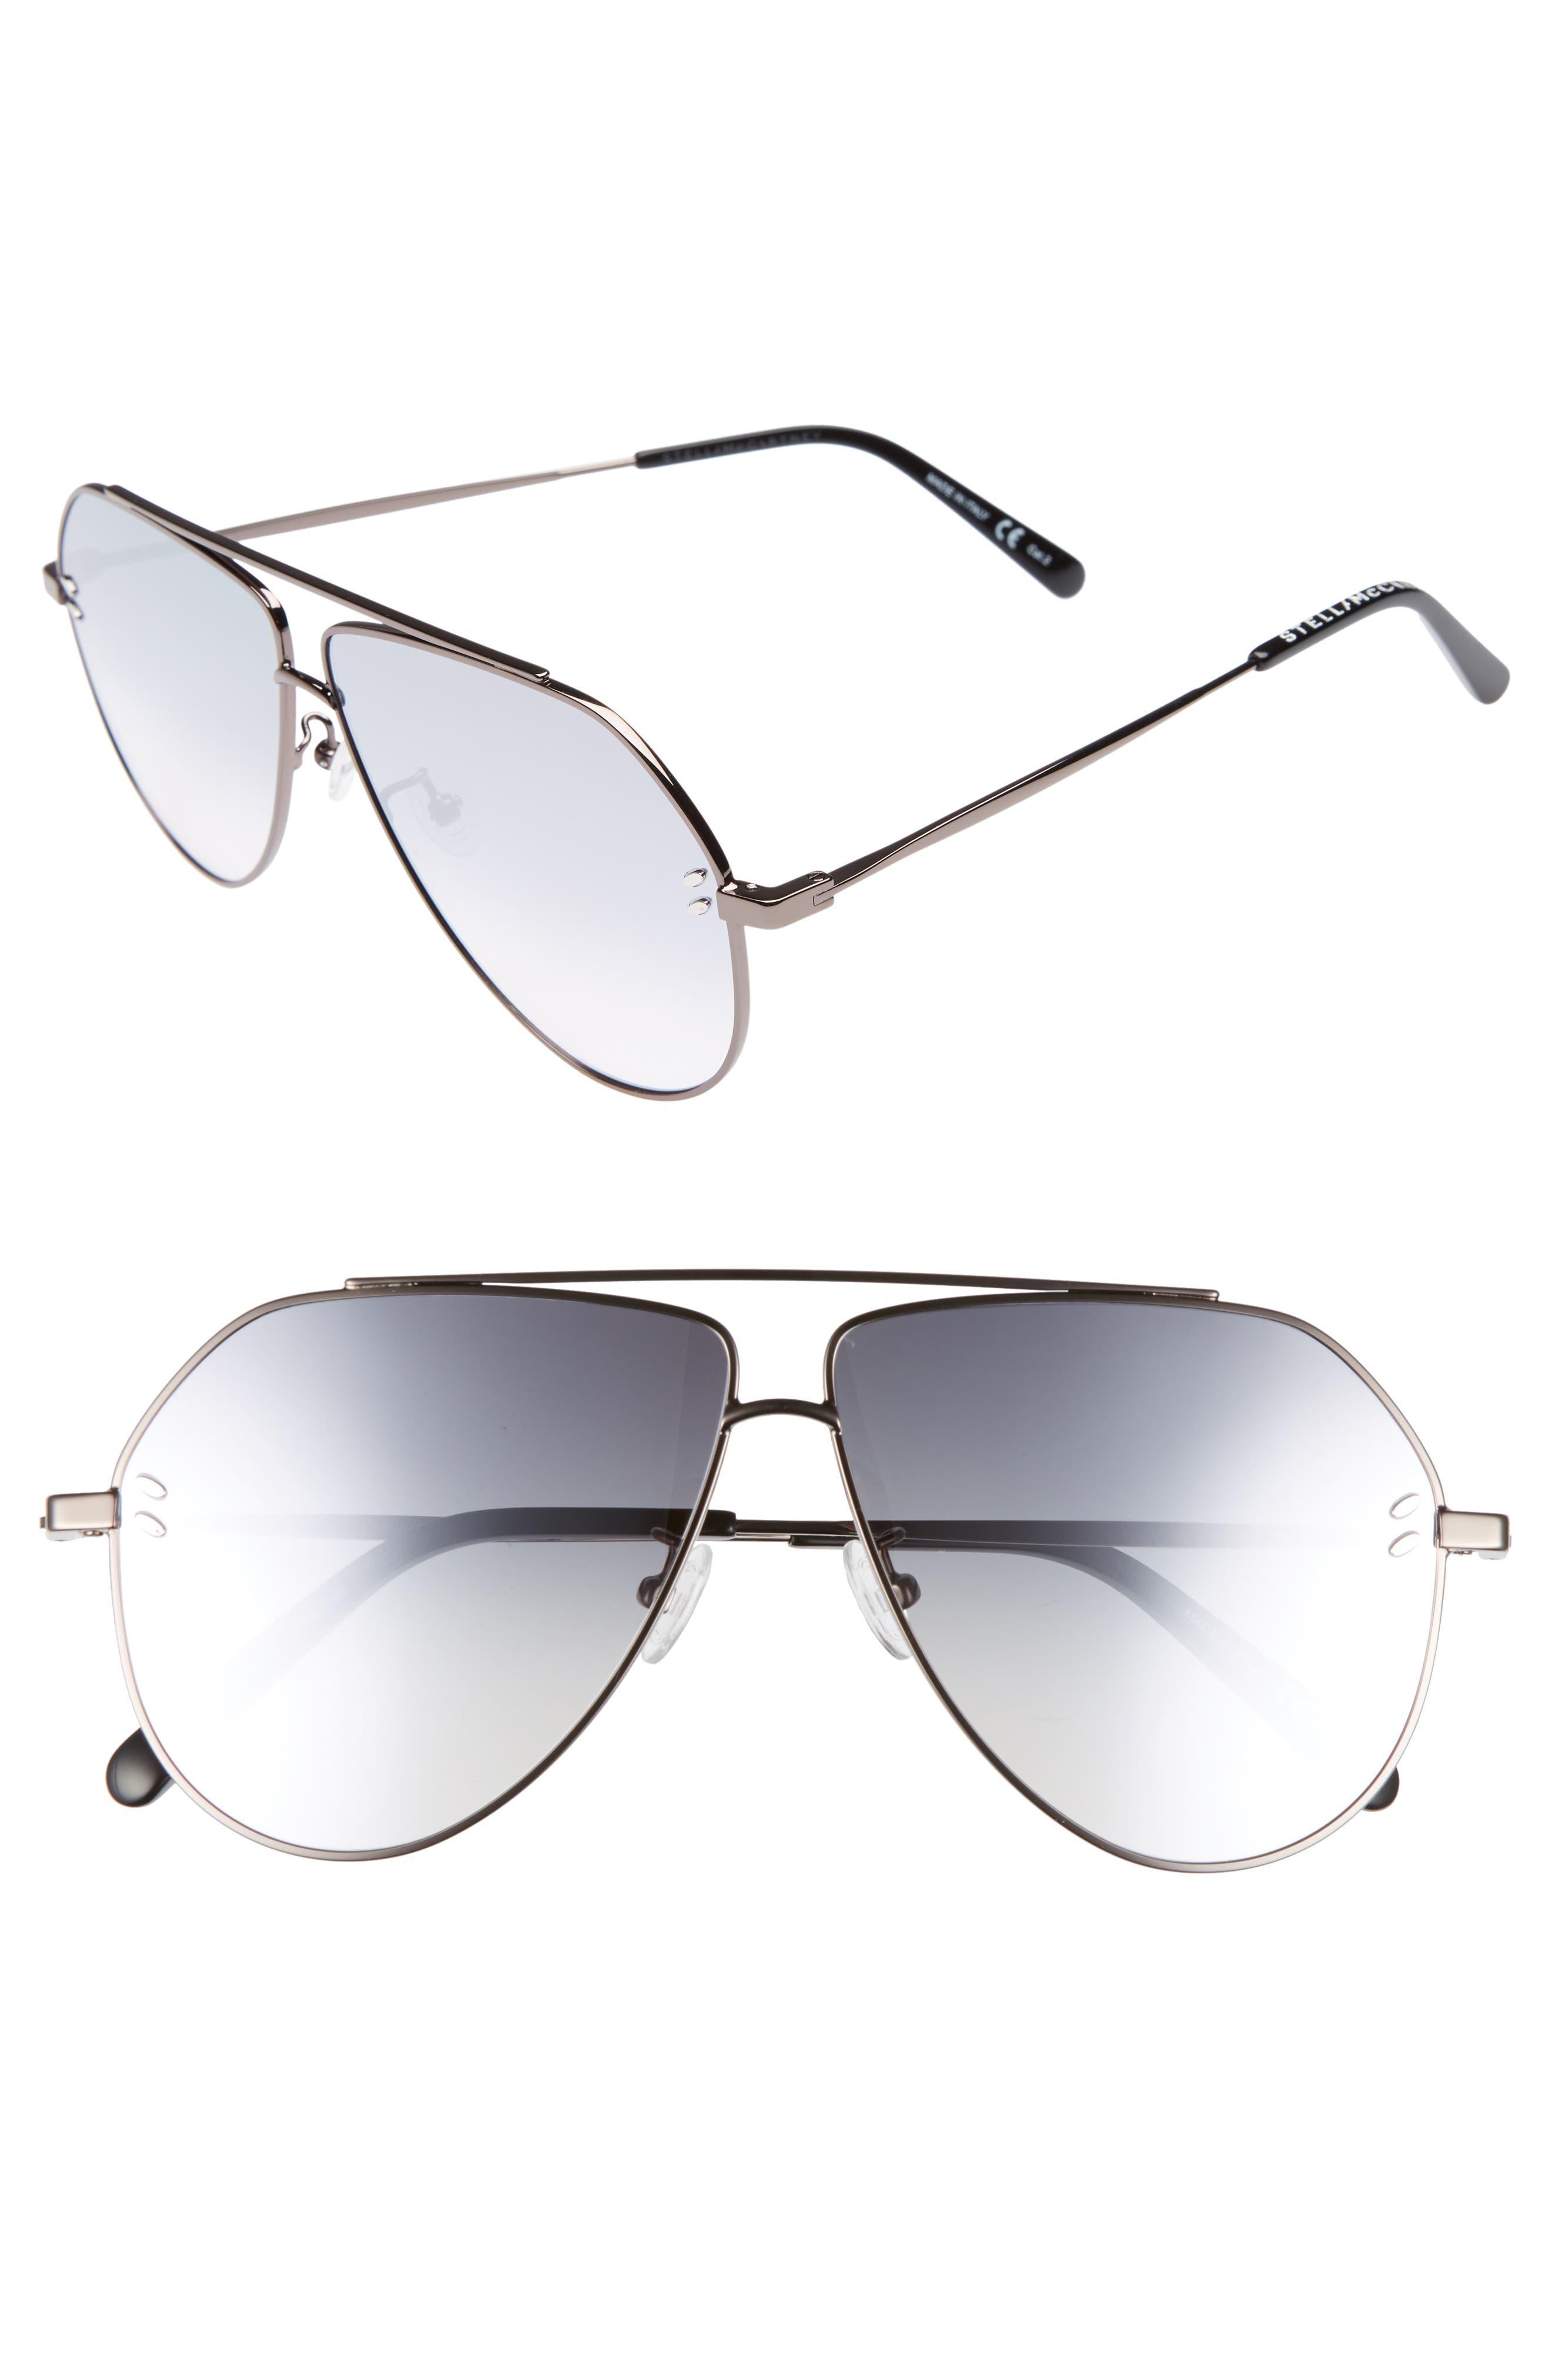 60mm Aviator Sunglasses,                         Main,                         color, 040